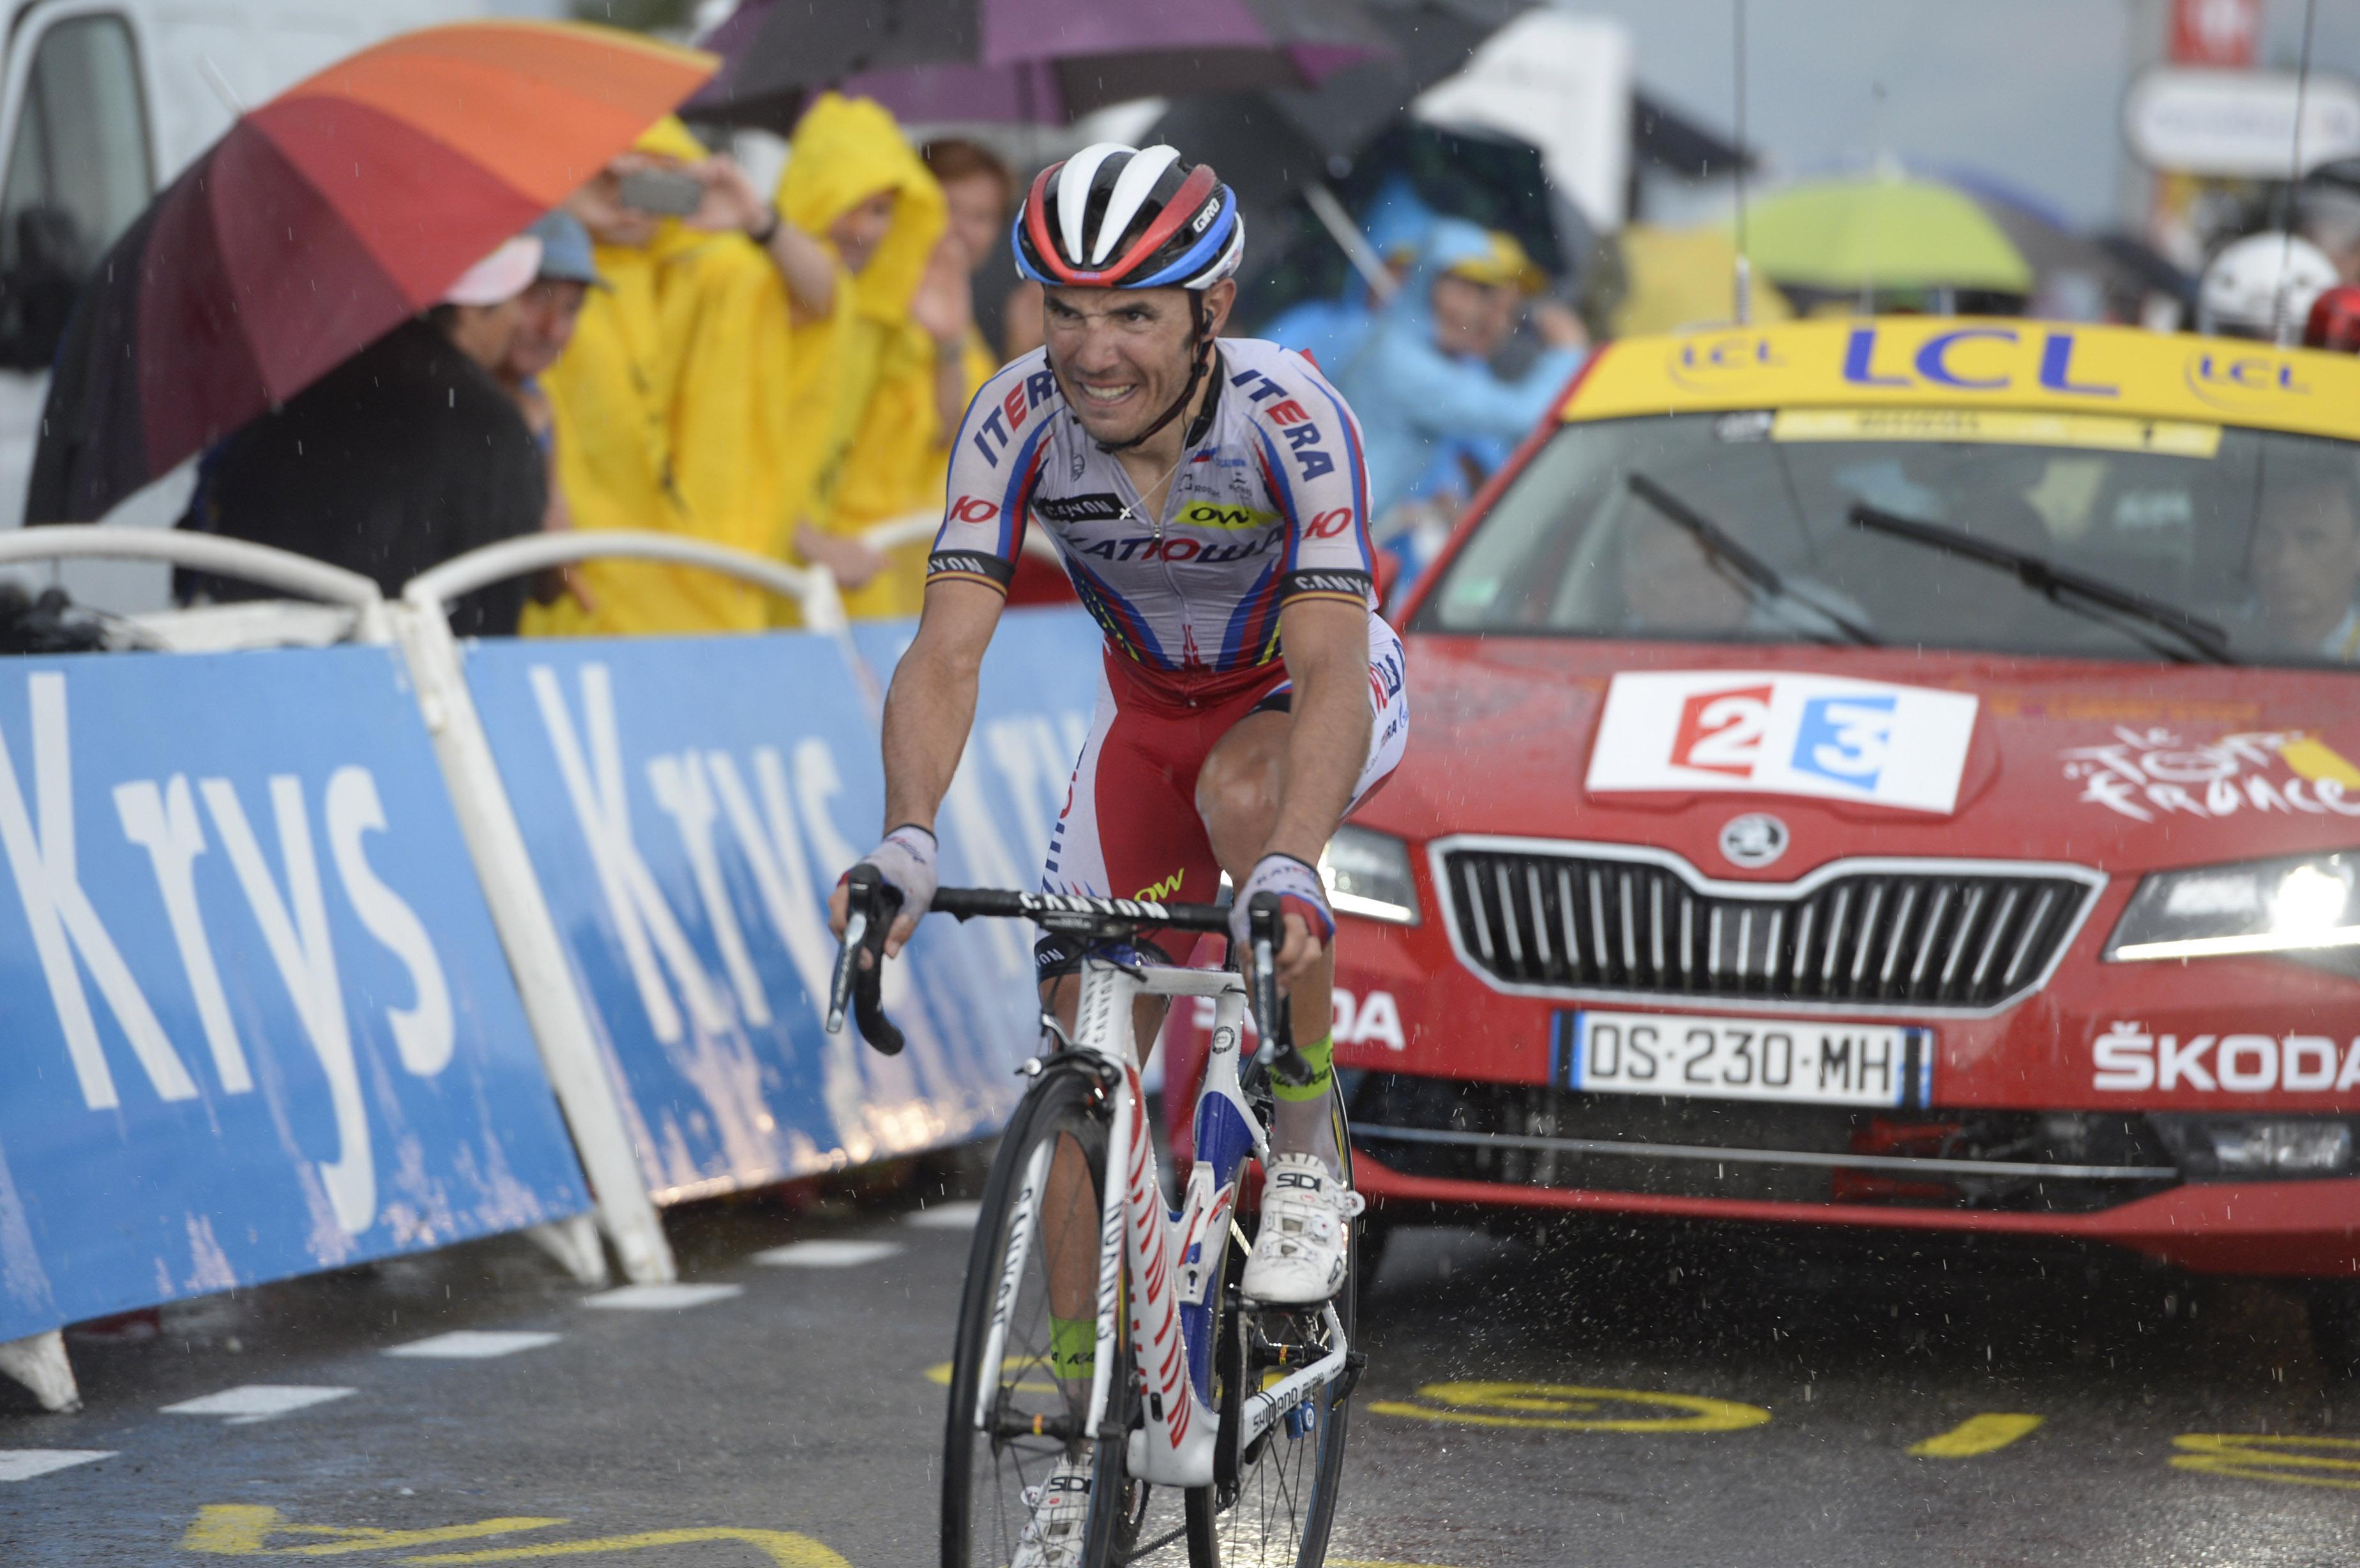 Tour de France 2015 - 12. Etappe - Joaquim Rodriguez gewinnt. (pic: Sirotti)